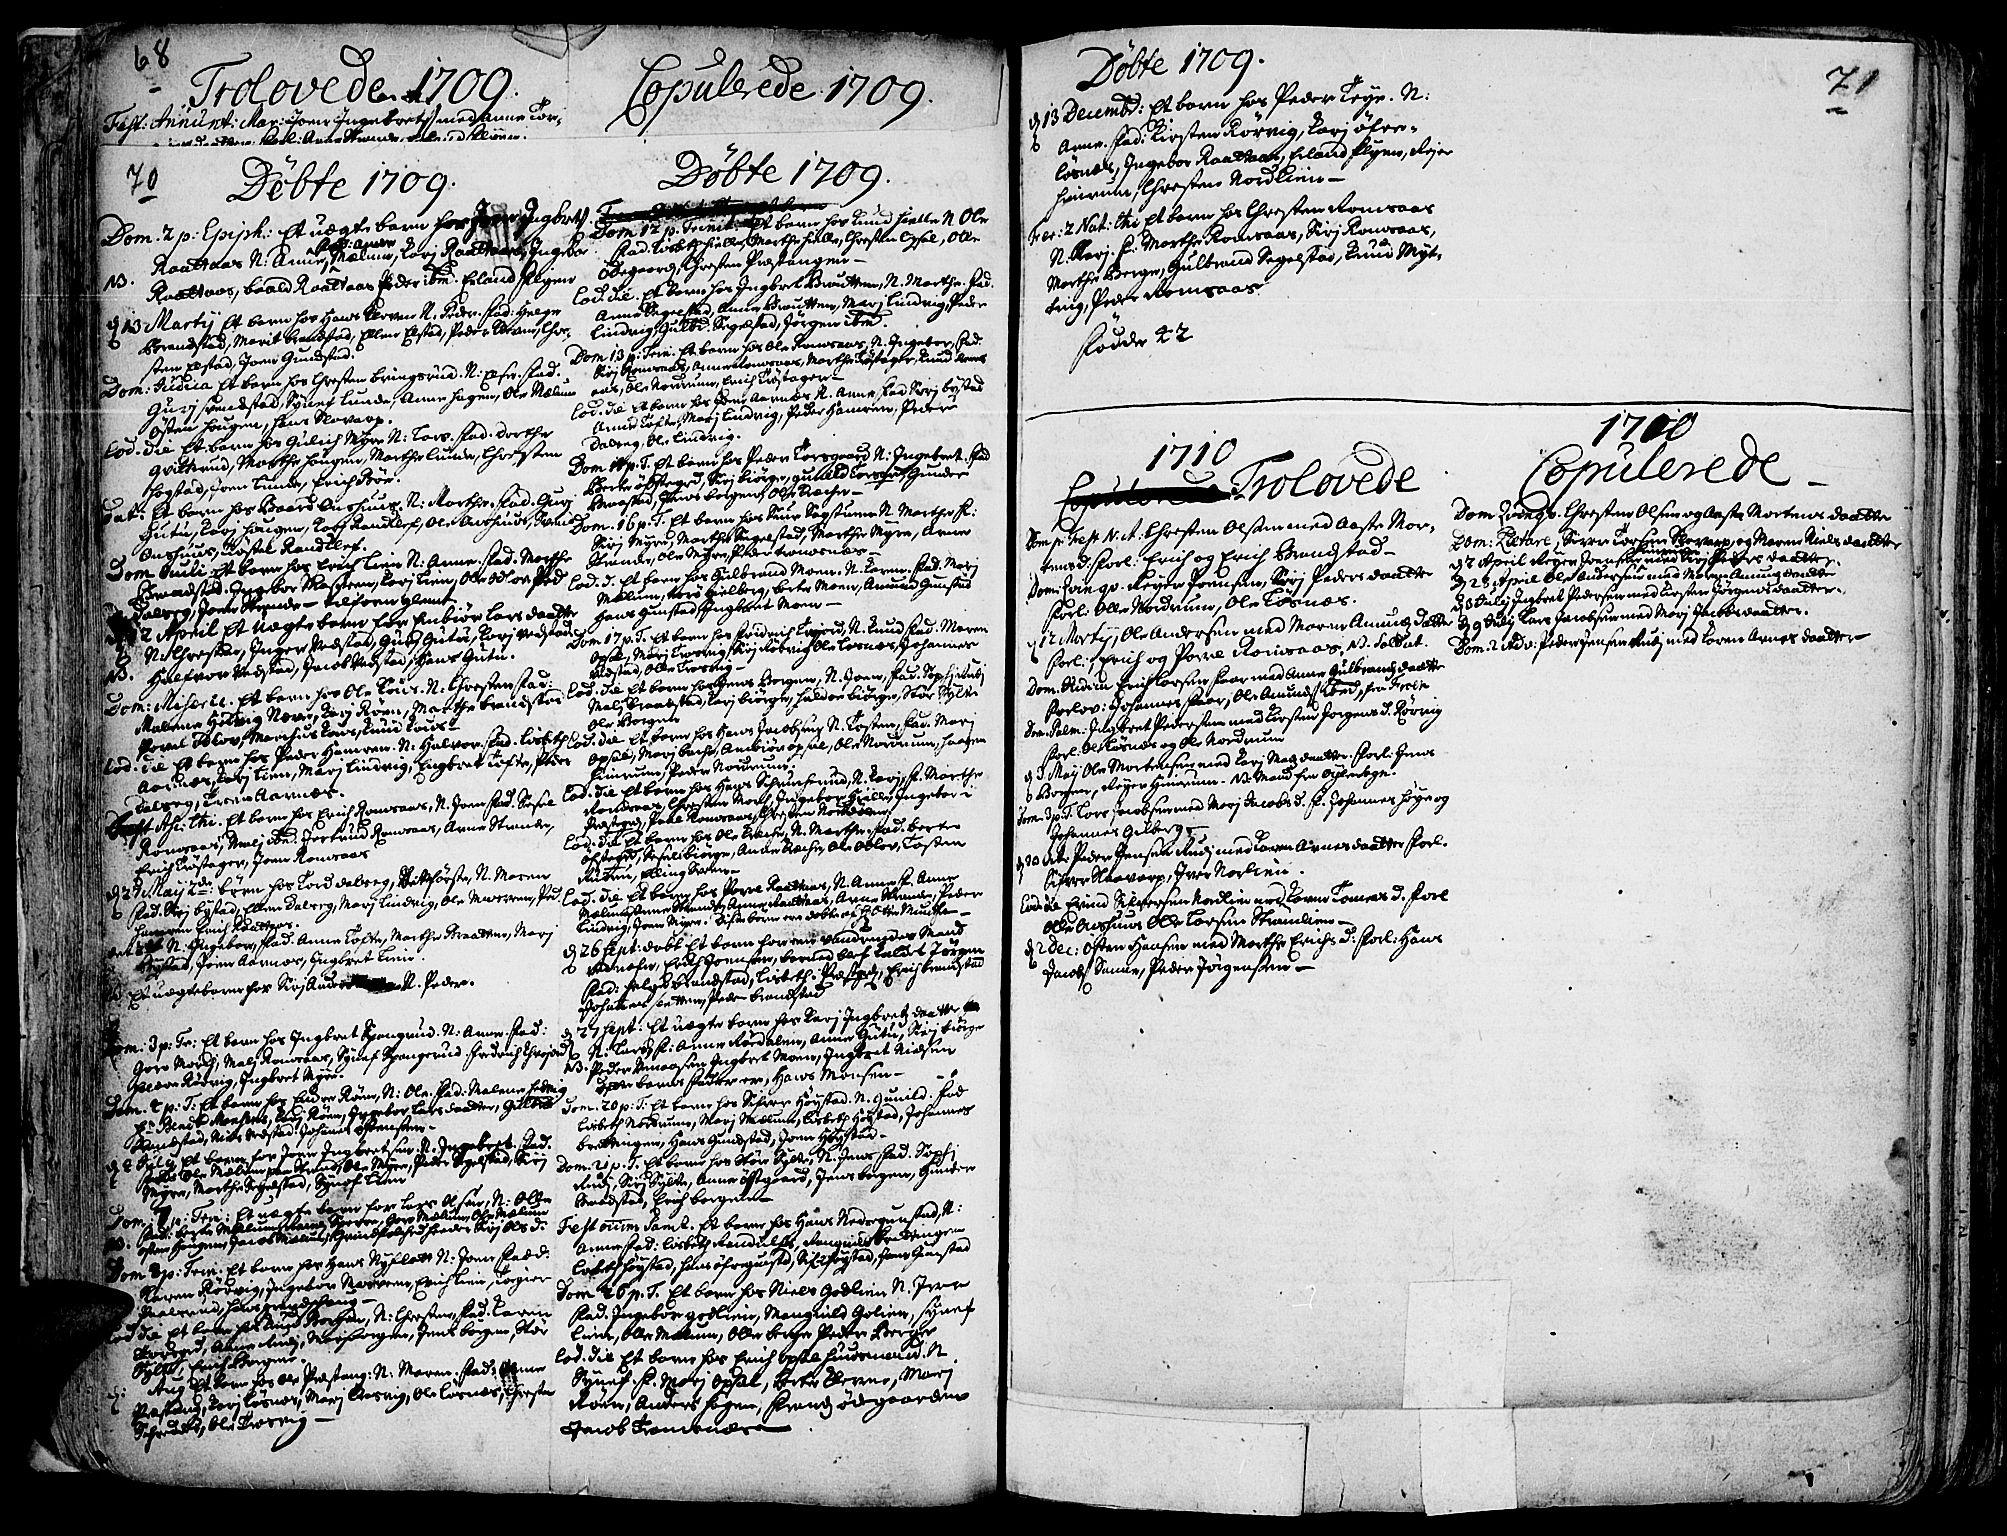 SAH, Ringebu prestekontor, Ministerialbok nr. 1, 1696-1733, s. 70-71